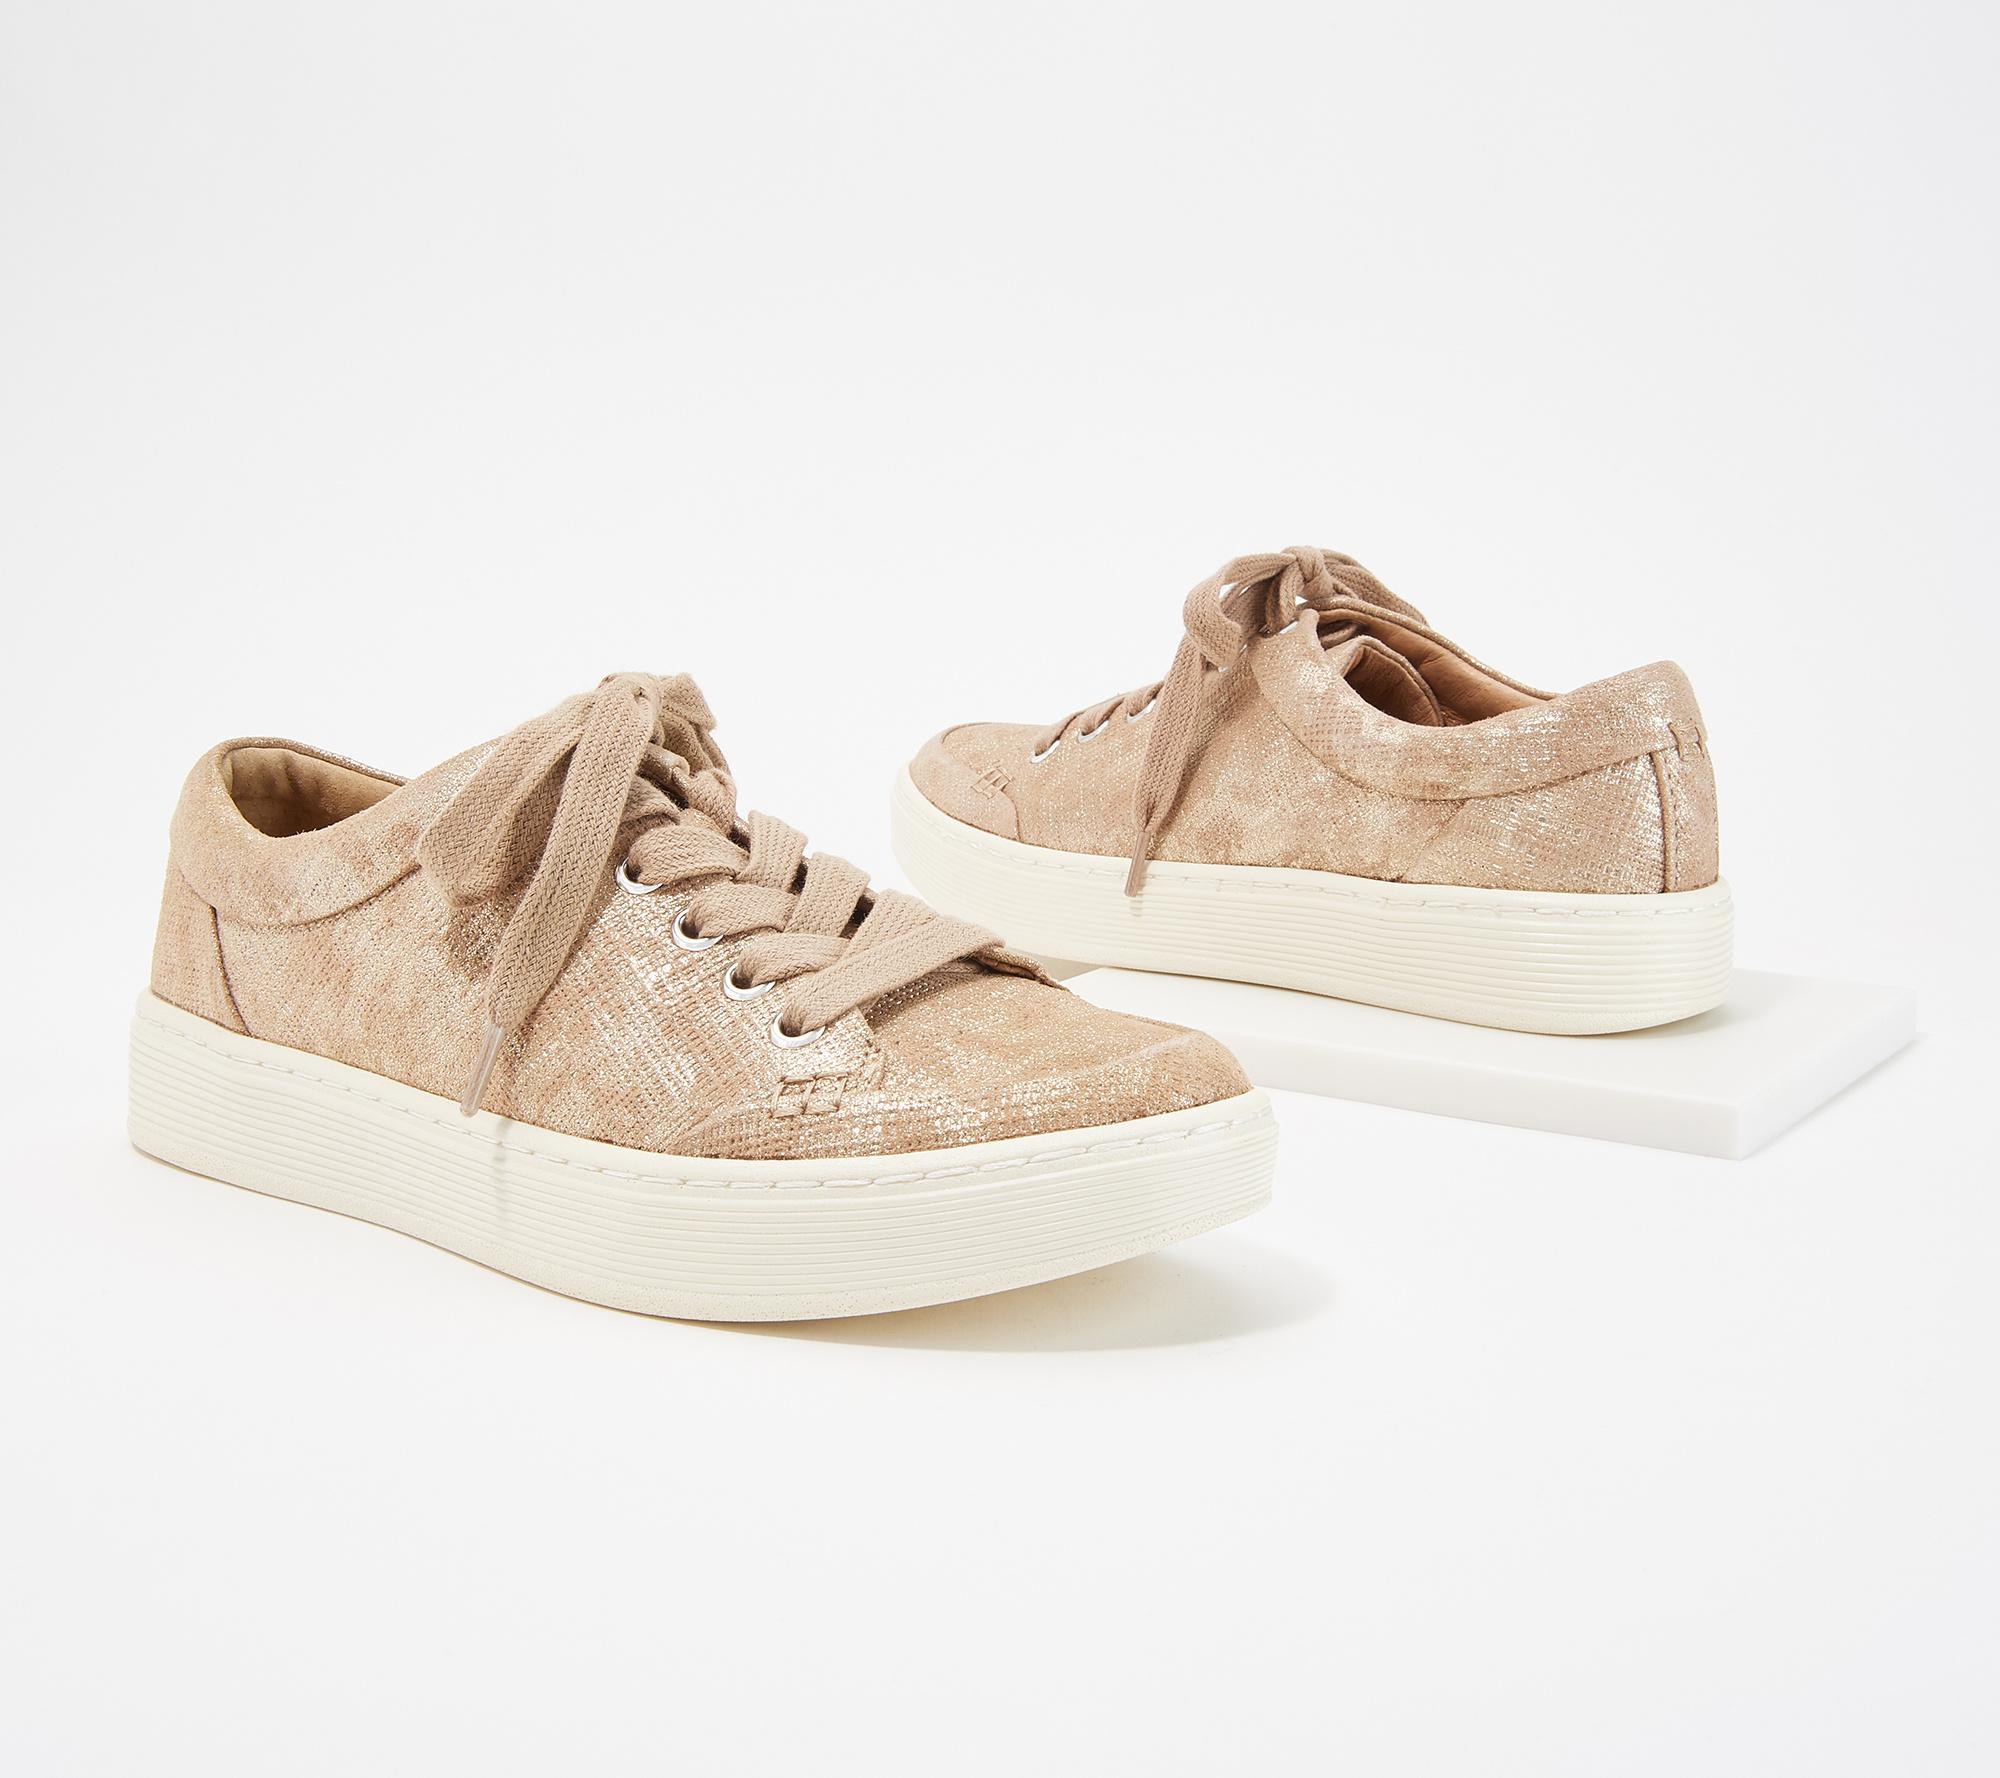 Sofft Sanders Sneaker (Women's)